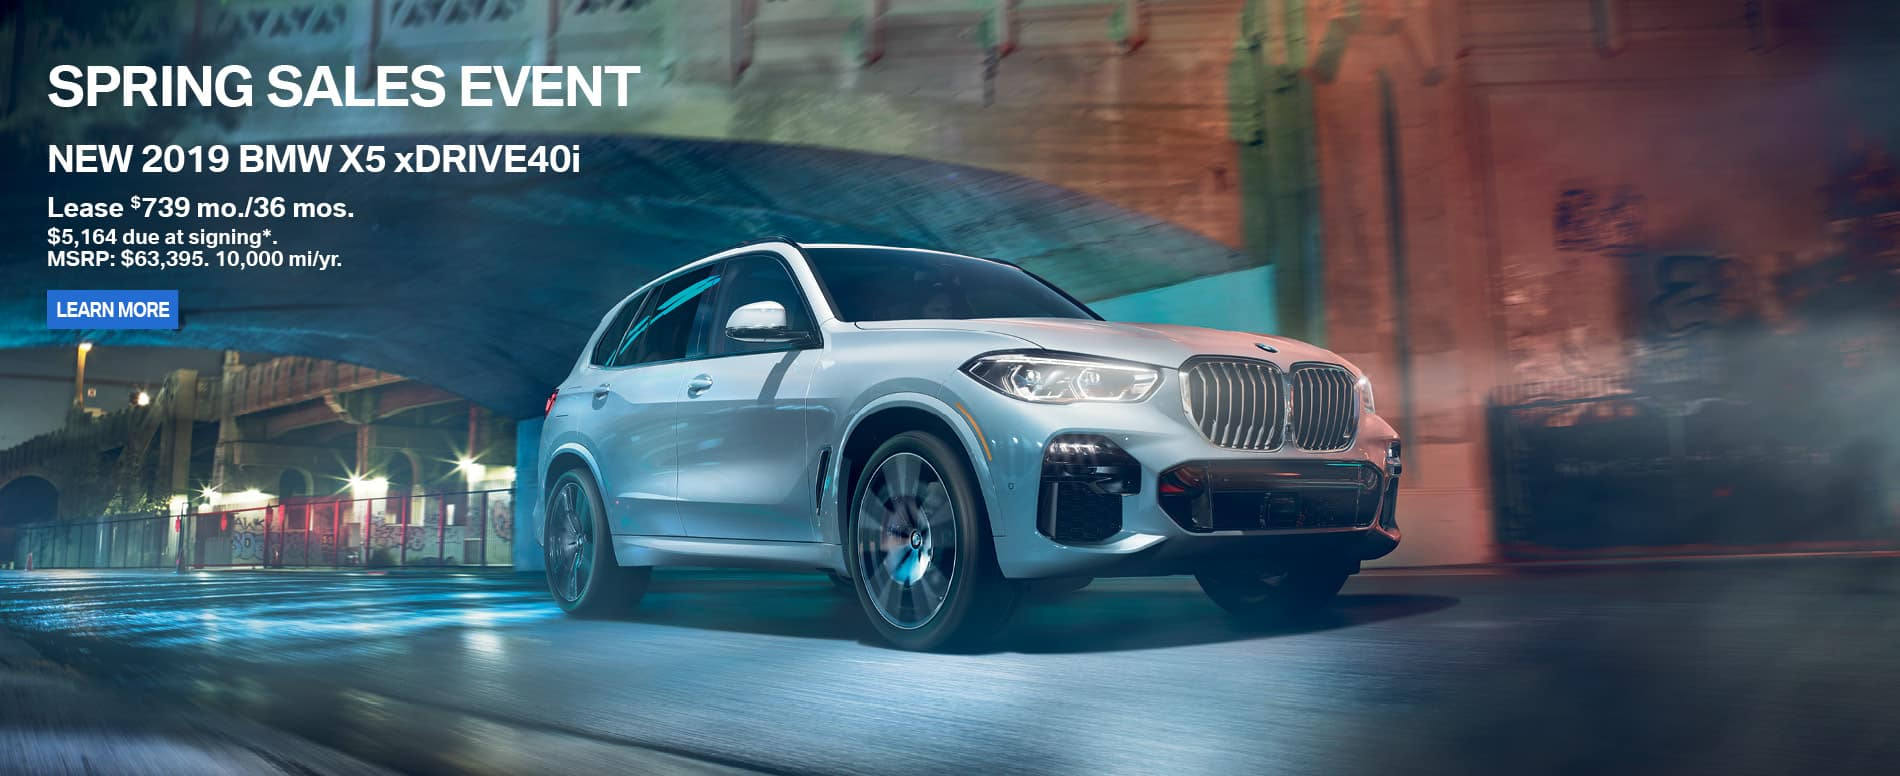 2019 BMW X5 Spring specials